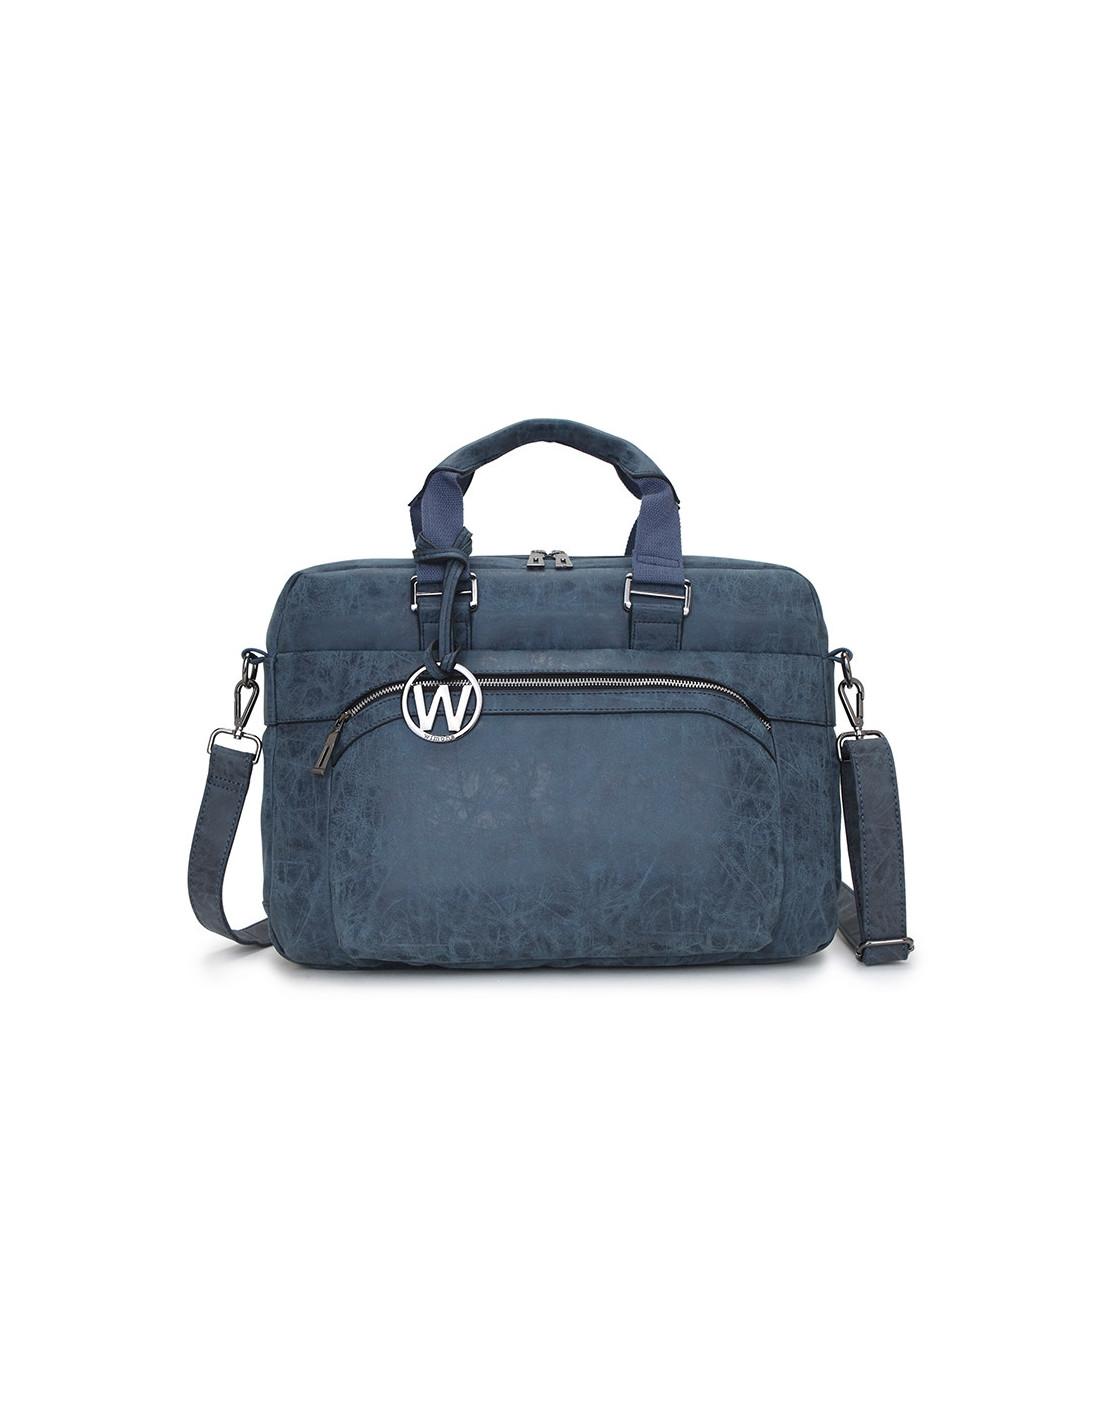 Wimona Schoudertas Donkerblauw : Wimona eliana schoudertas donkerblauw kopen